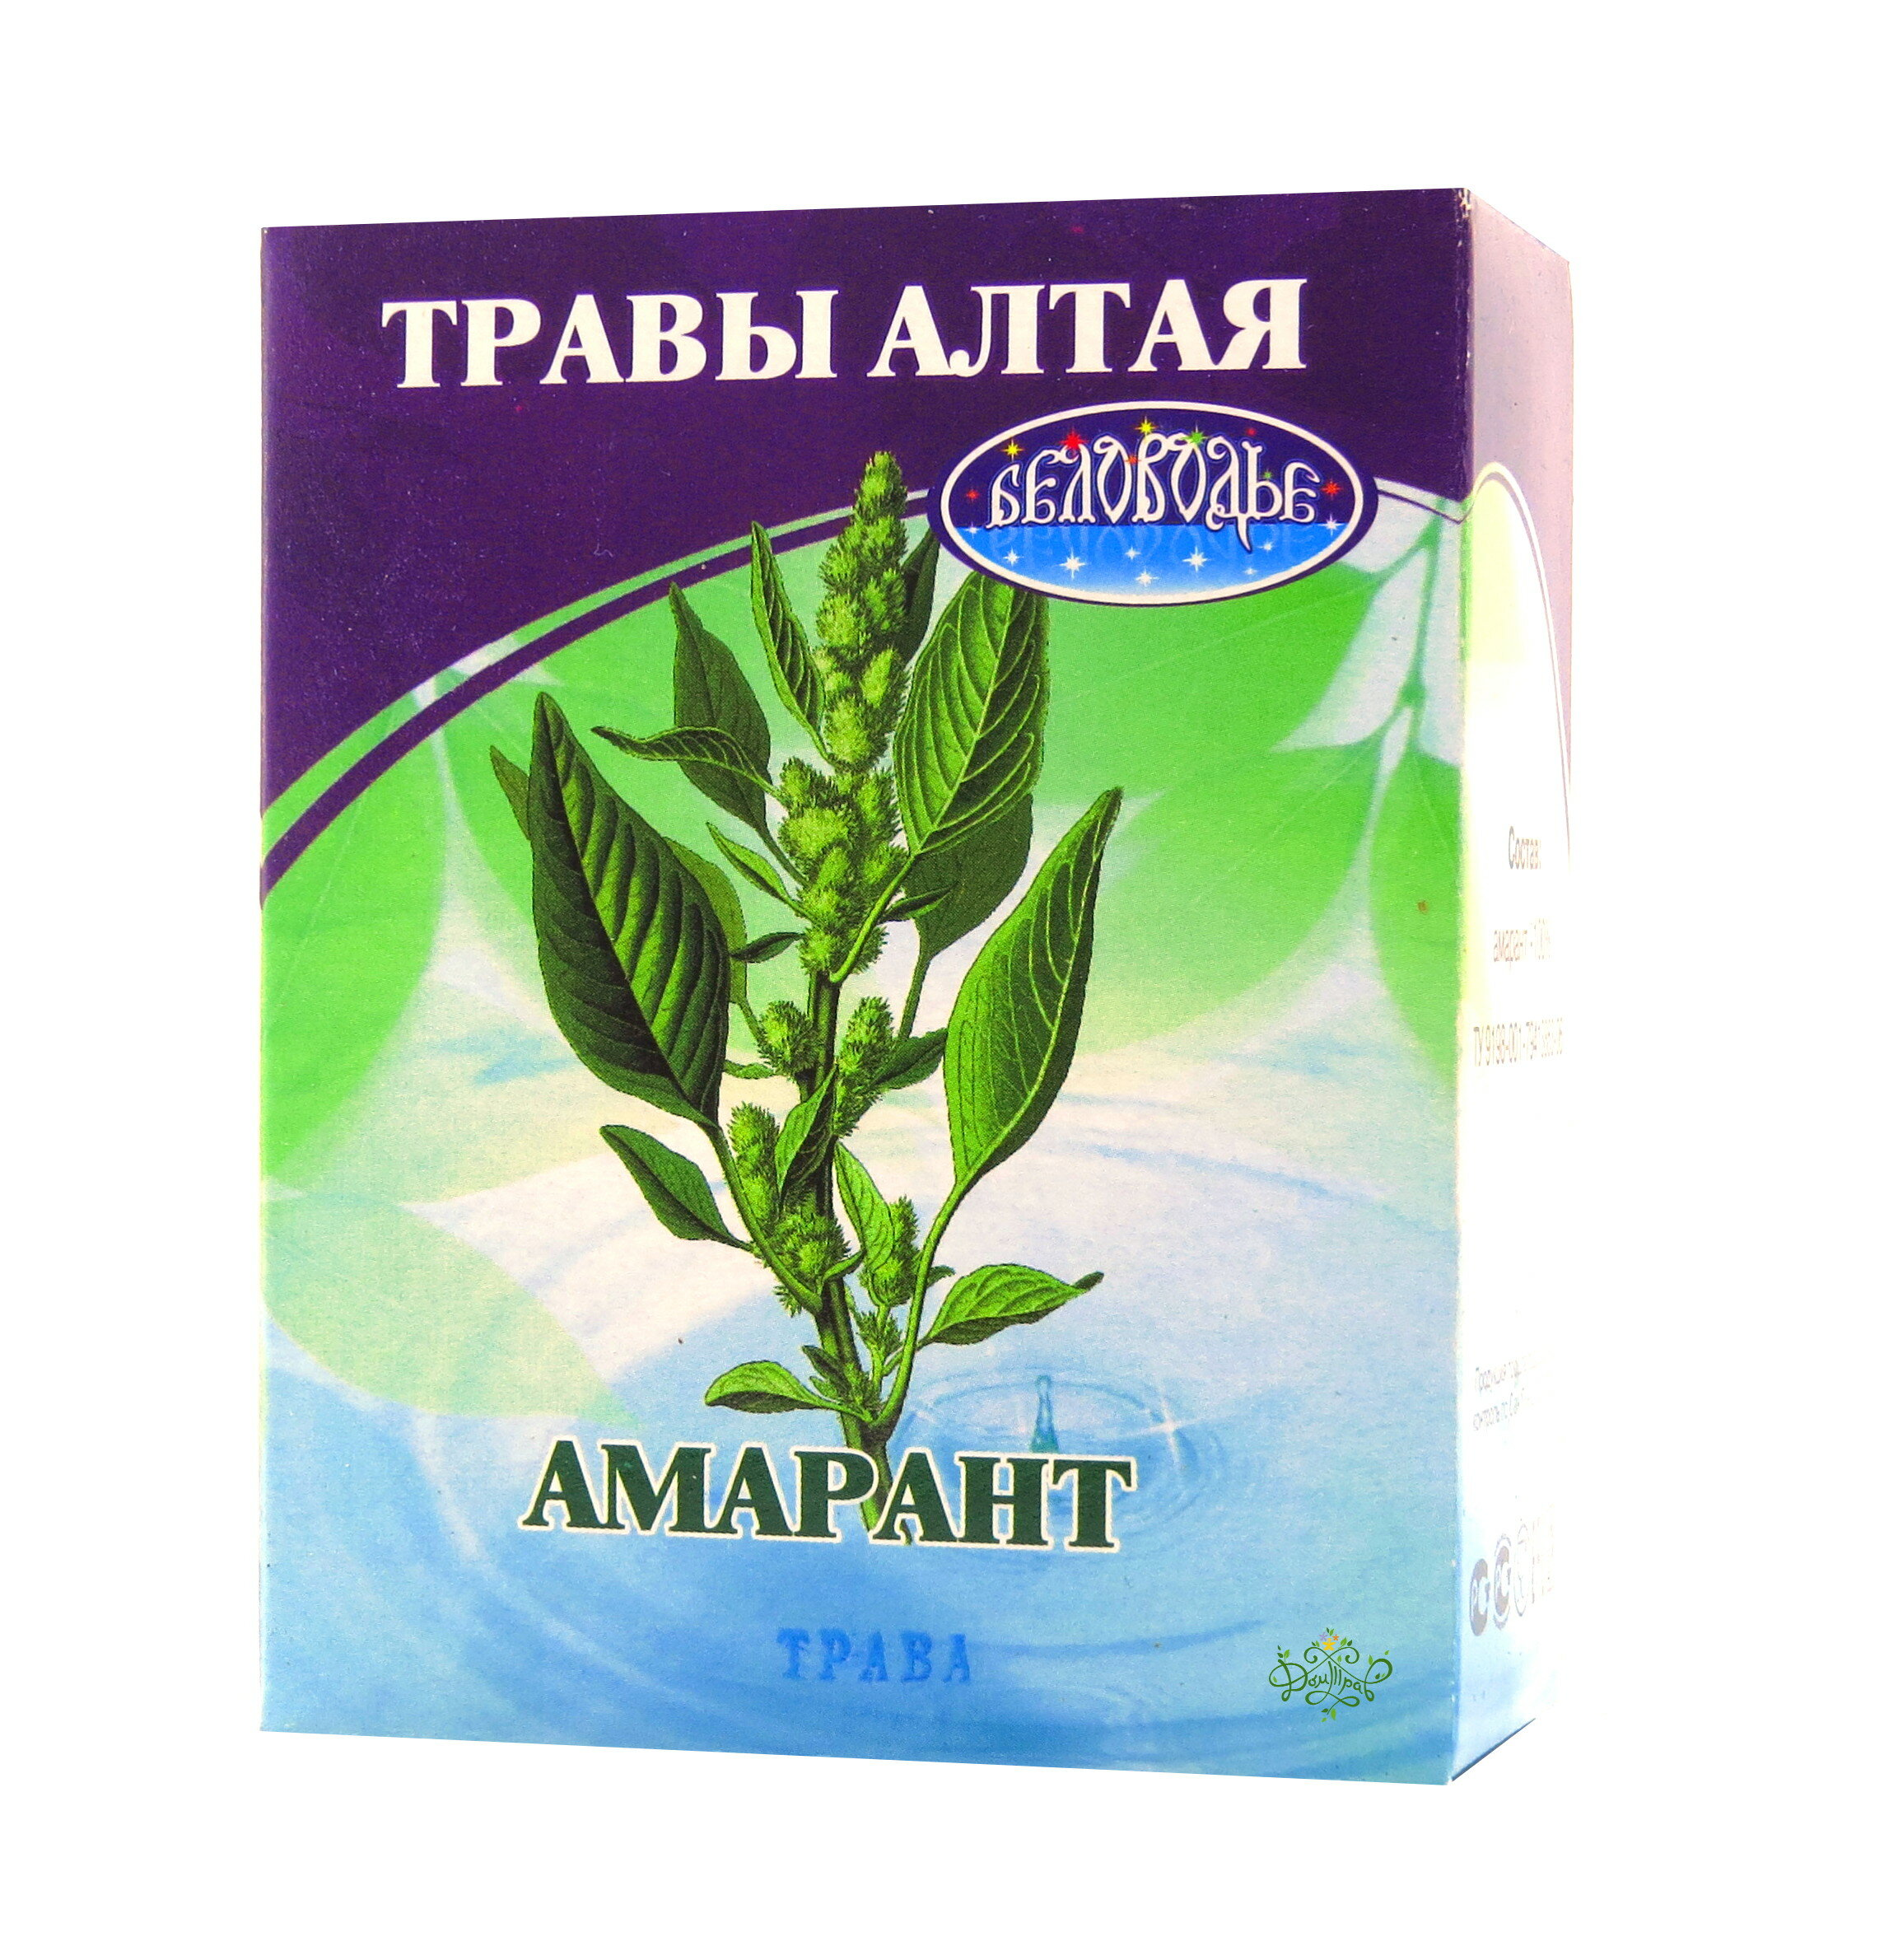 Амарант трава (листья амаранта), 50 г